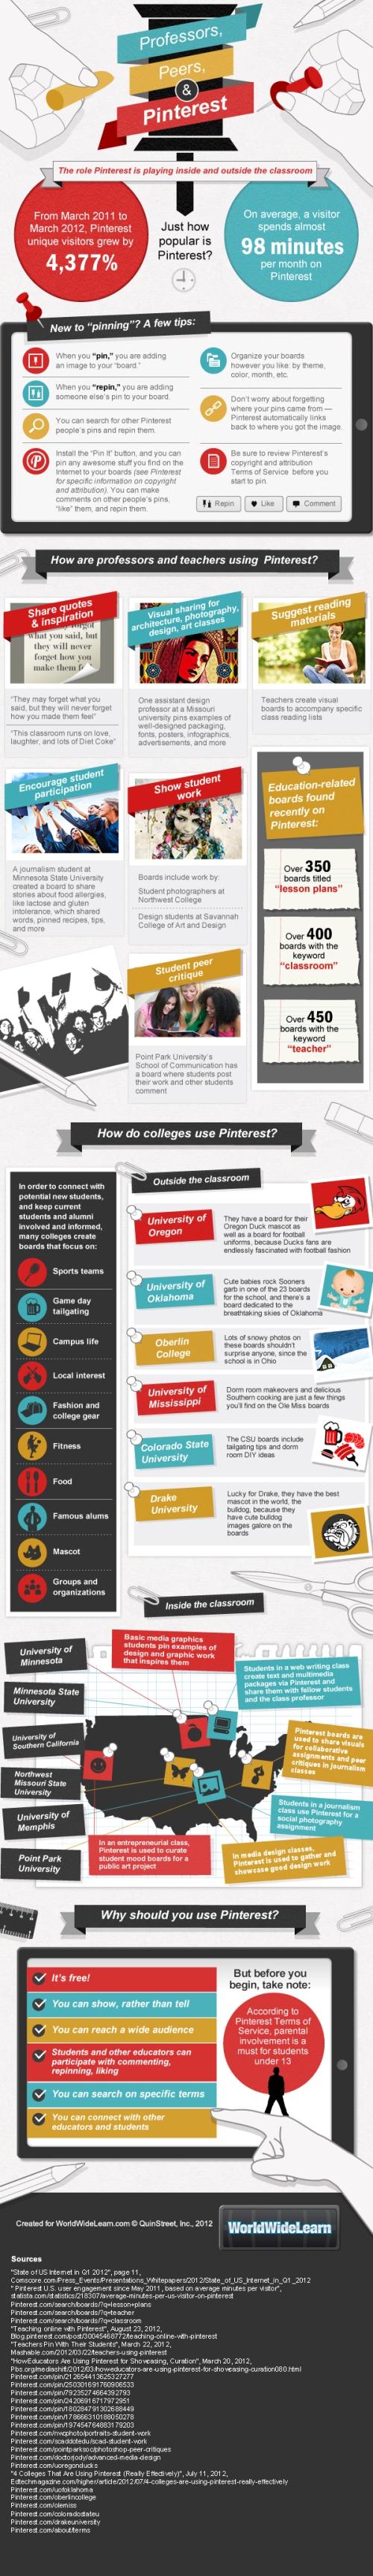 professors-peers--pinterest_519d5142ef379